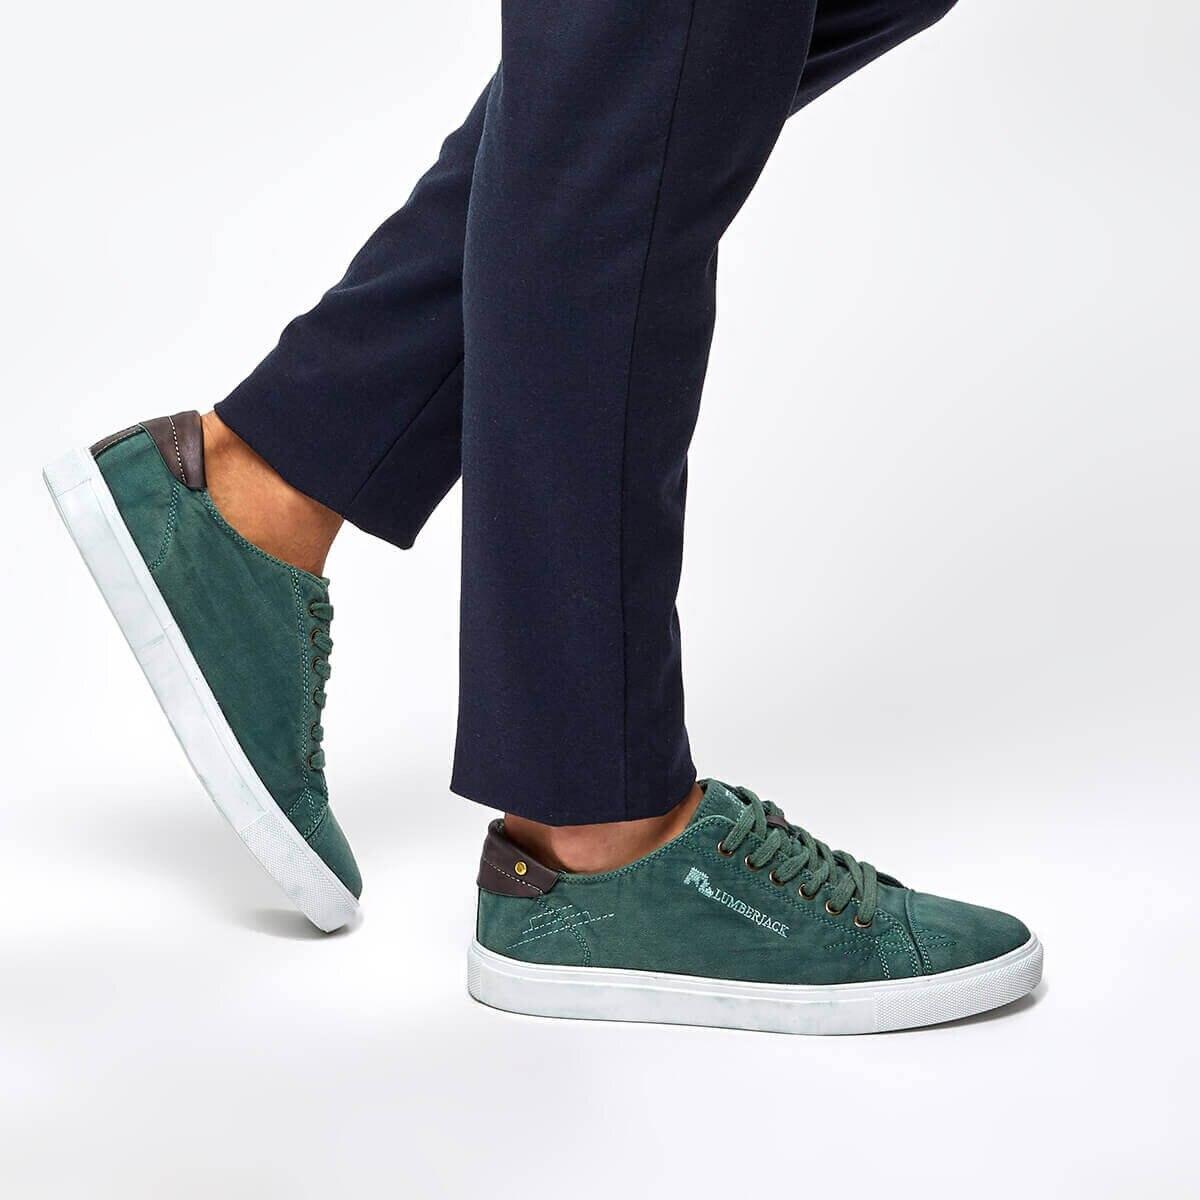 FLO Green Men Sneaker 2020 New Casual Shoes Men Flat Shoes Lace-up Low Top Sneakers Tenis Masculino LUMBERJACK DALTON